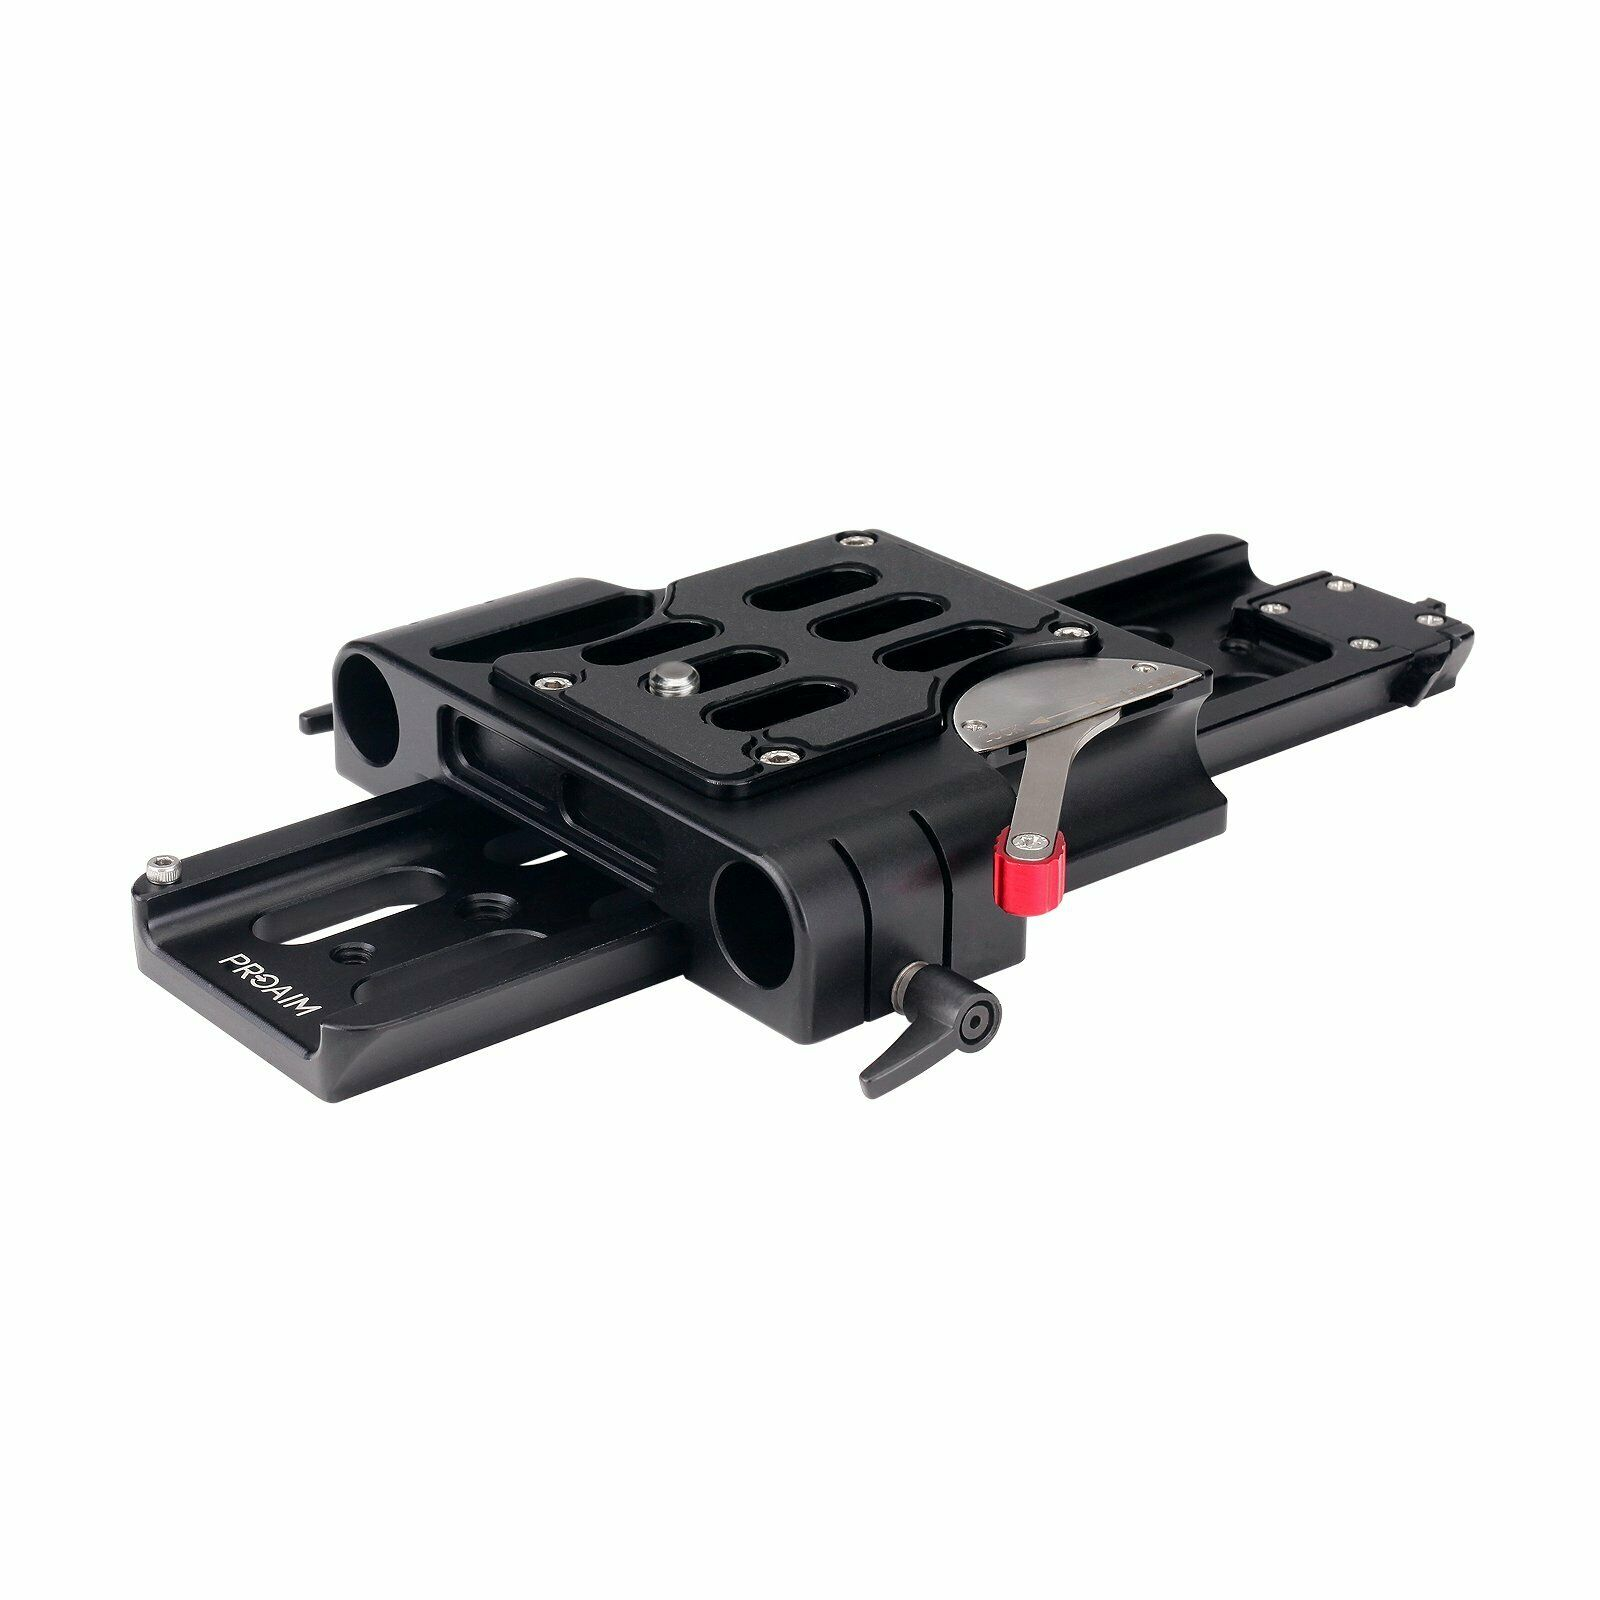 Proaim19mMQuick Release Camera Base Plate with Dovetail(ARRI Standard)P-BPDP-19